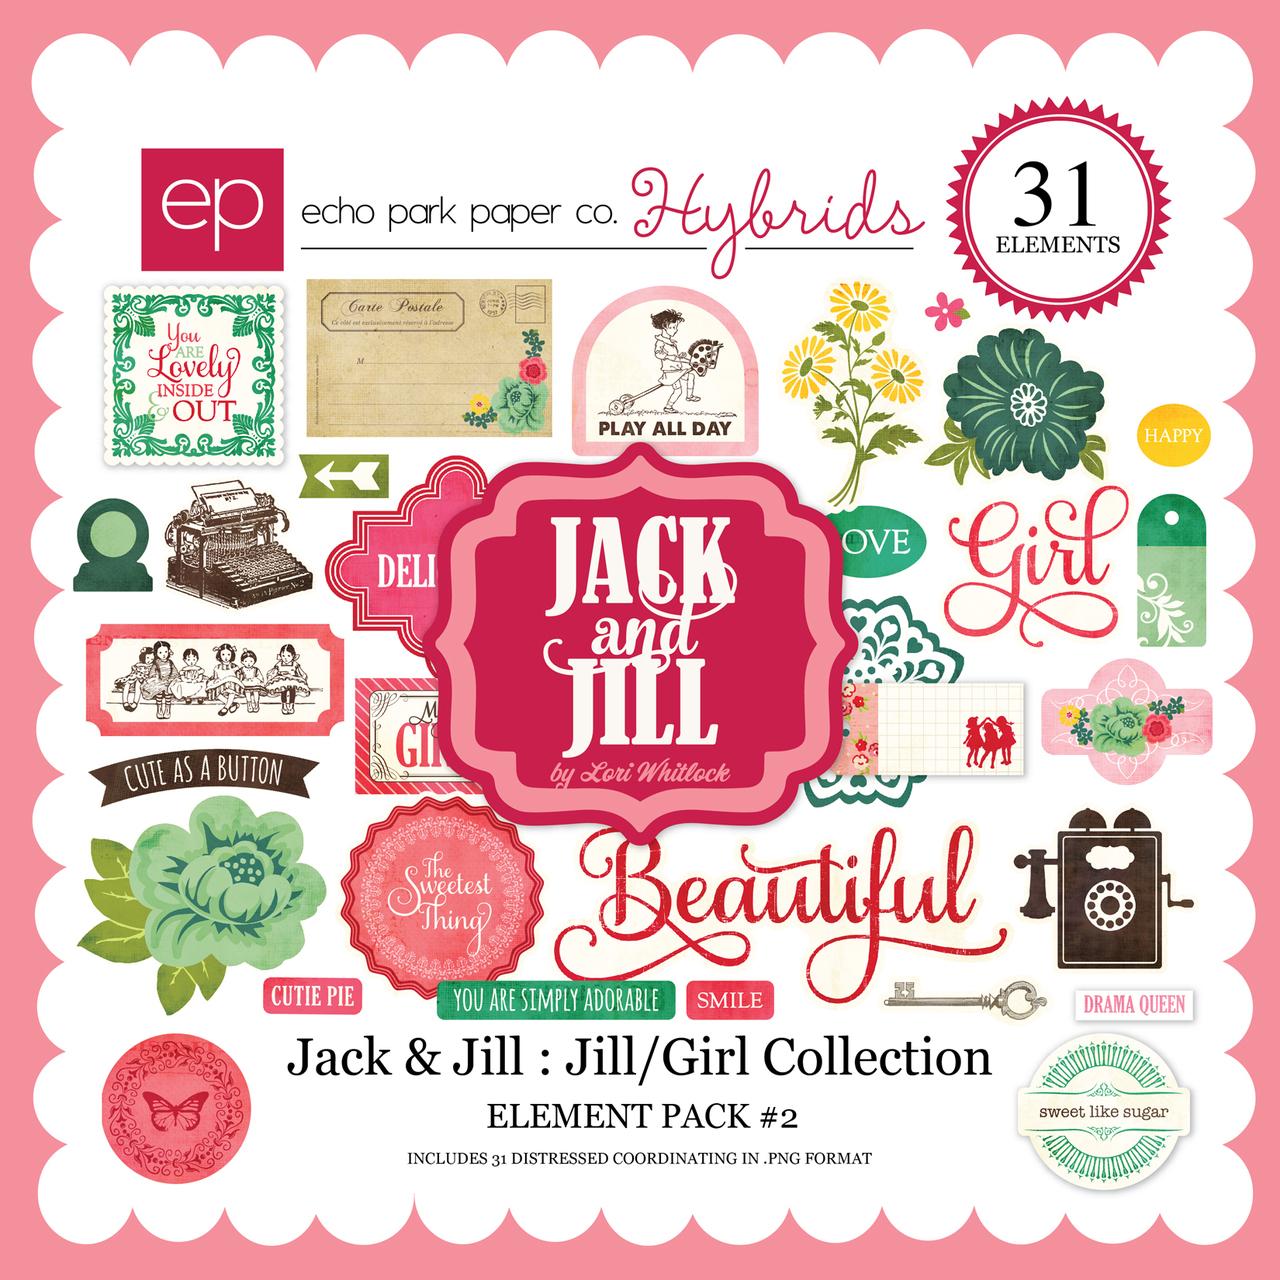 Jack & Jill: Jill/Girl Full Collection